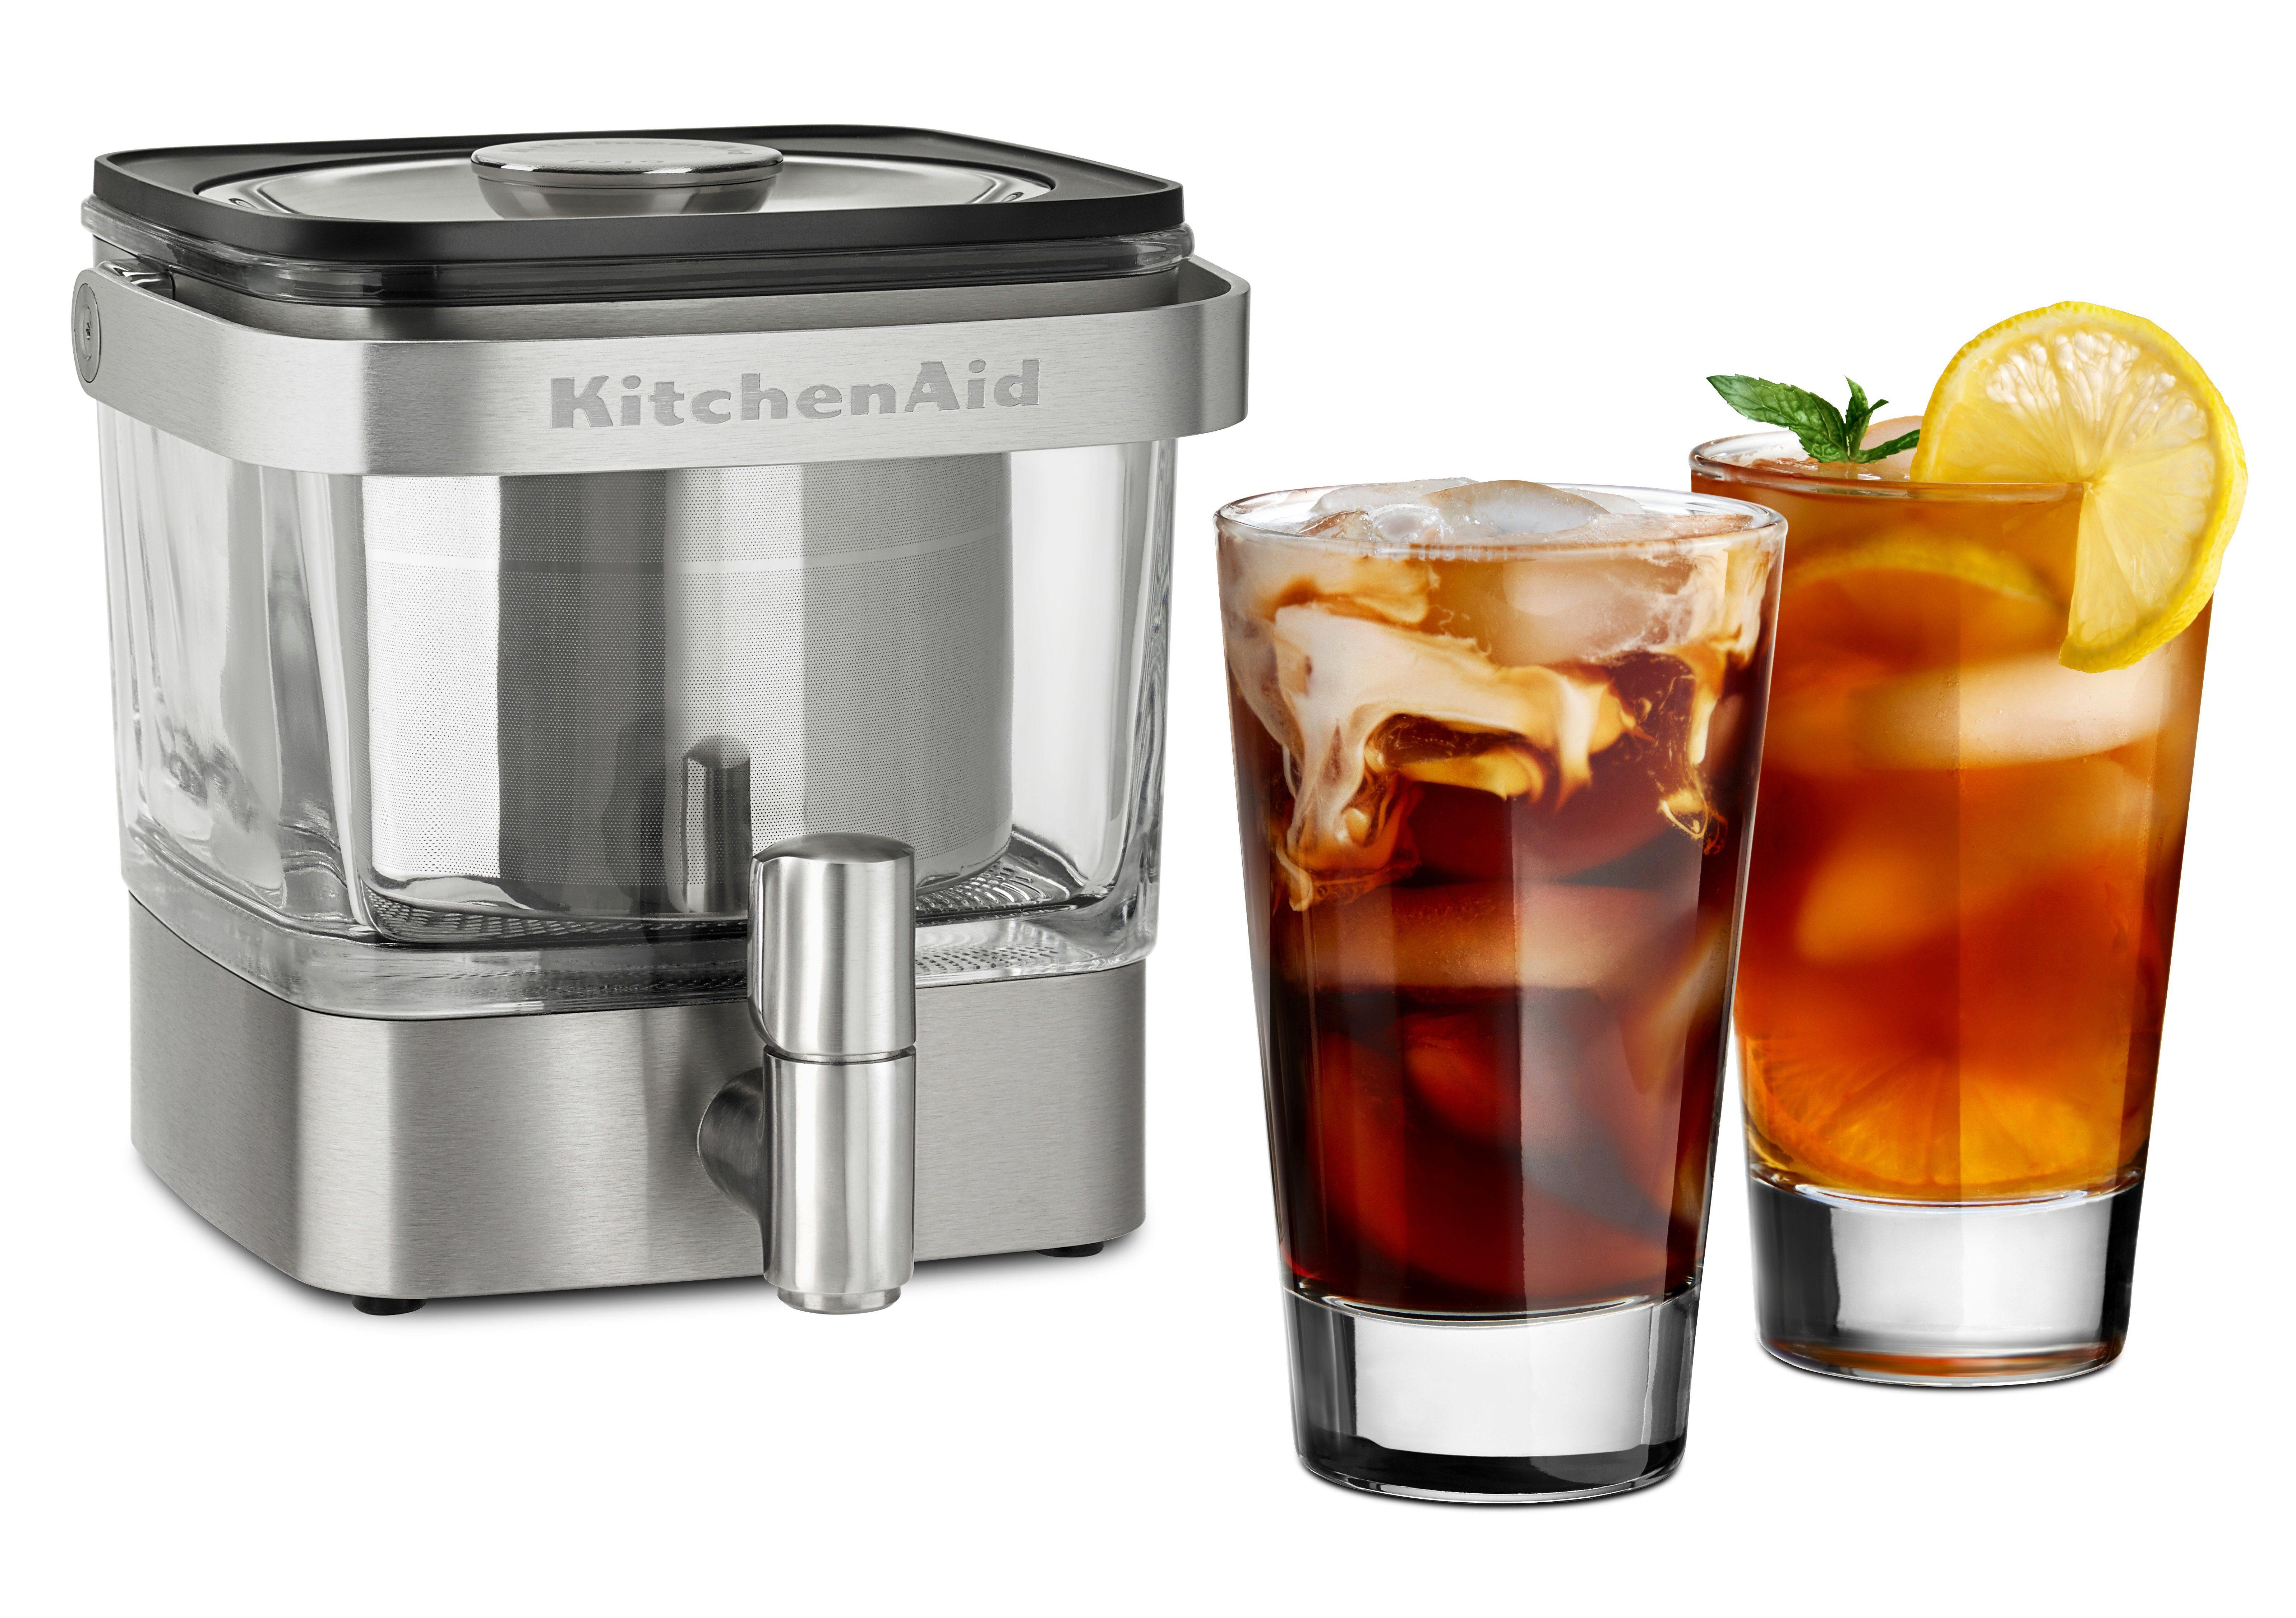 KitchenAid Kaffeebereiter KitchenAid Cold-Brew-Kaffeebereiter 5KCM4212SX